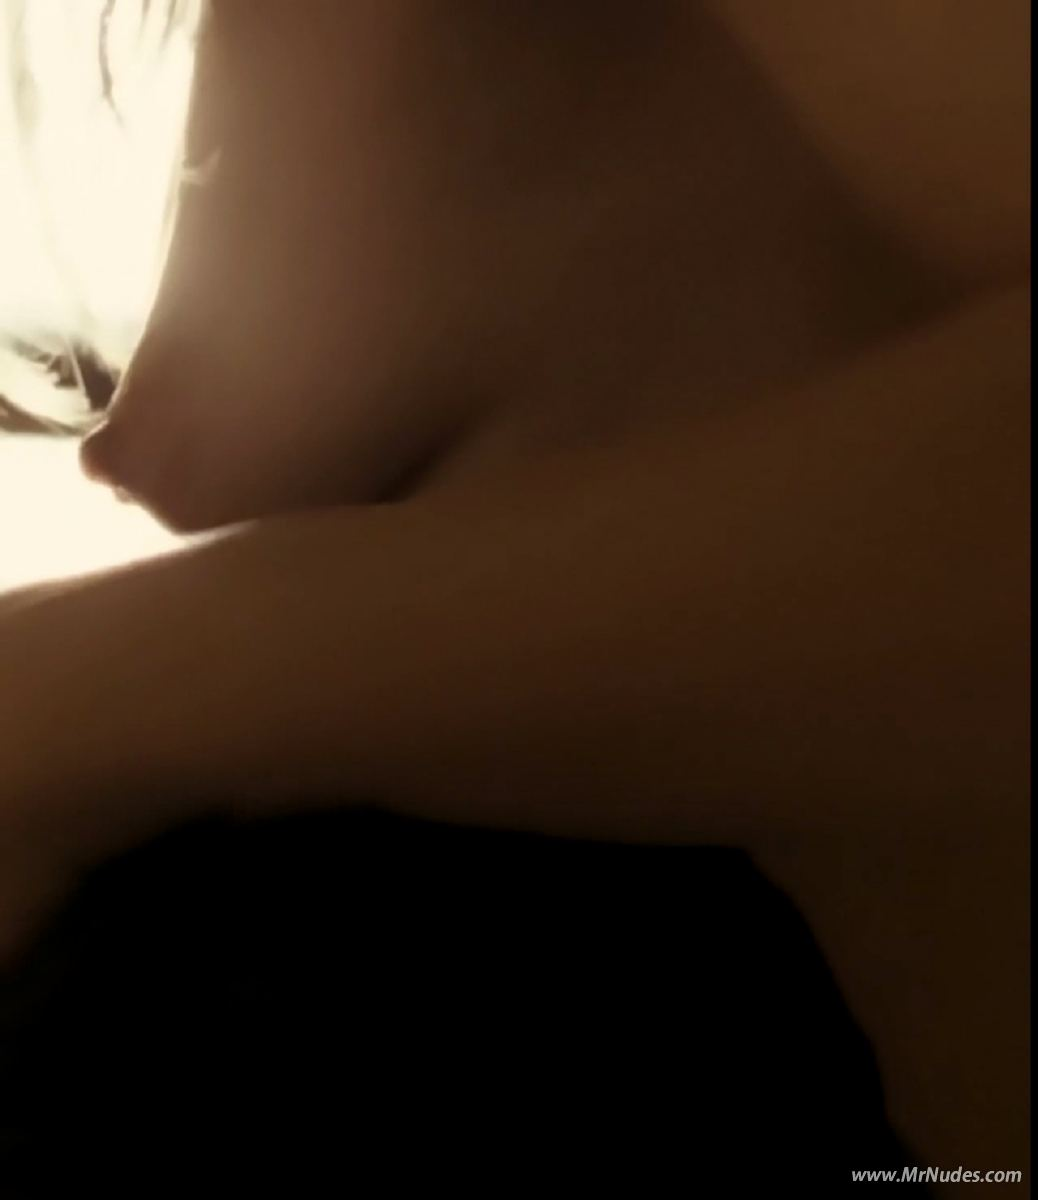 spring break flasher ass nude